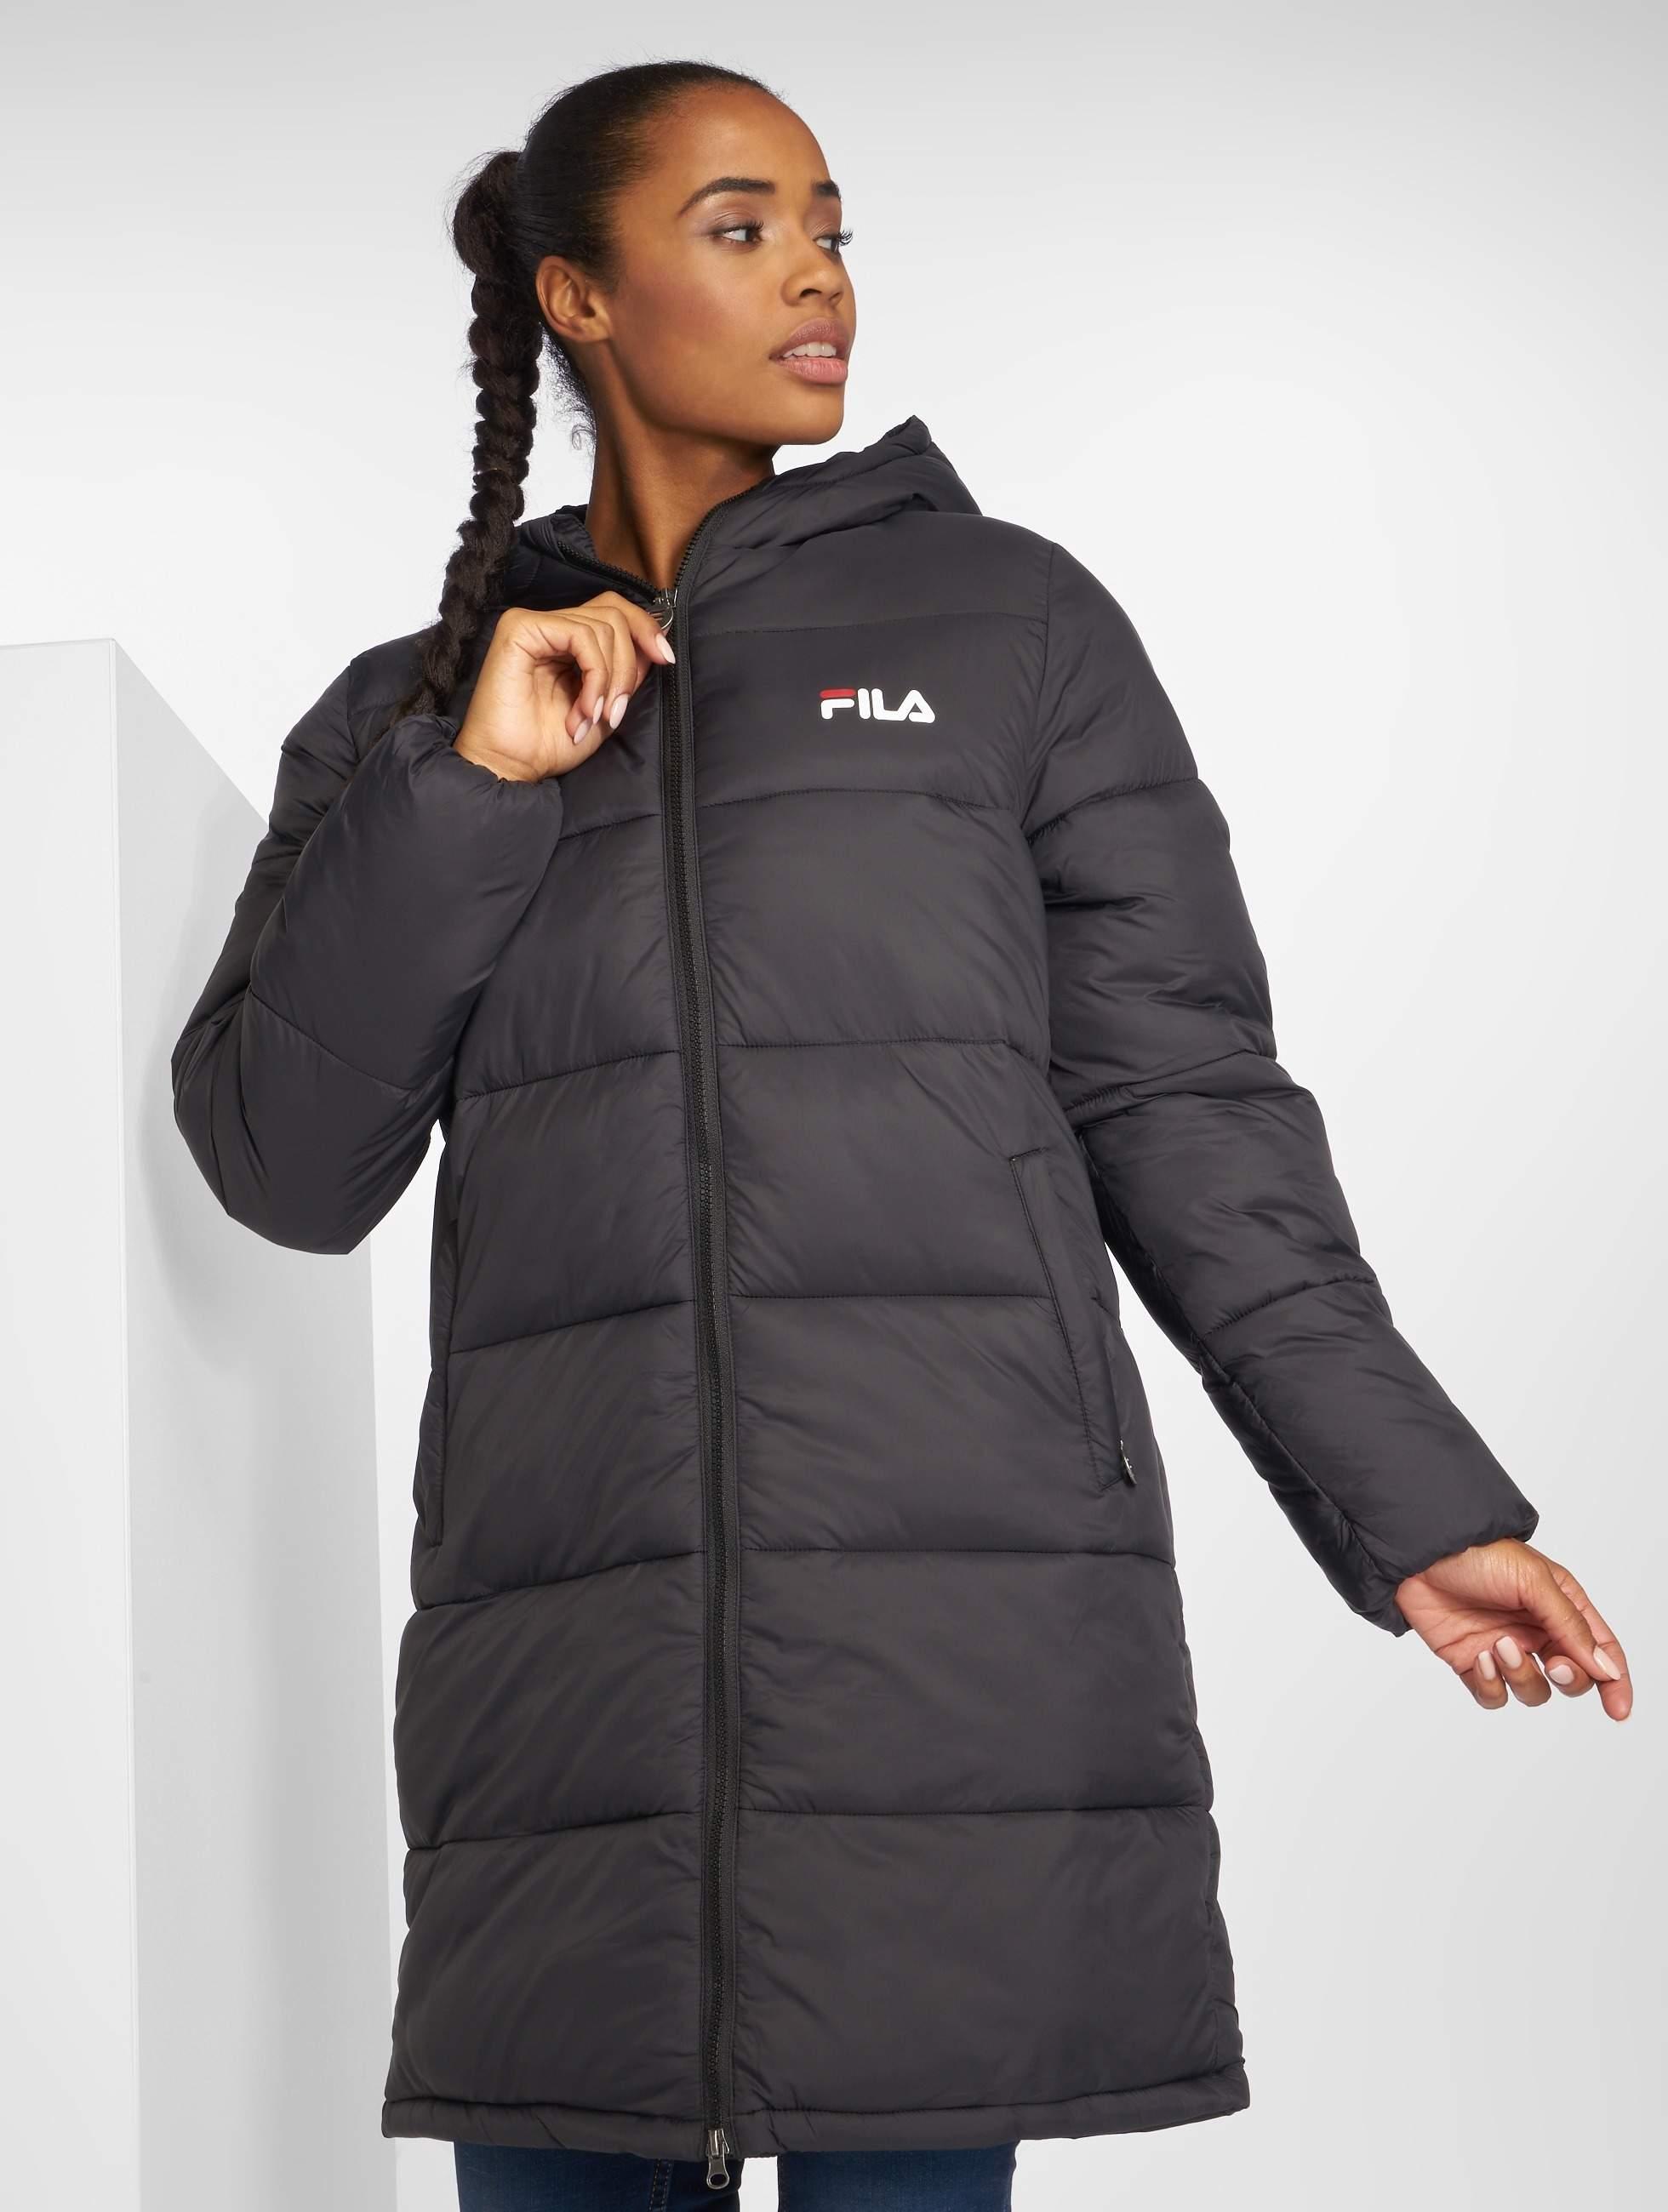 Line Zia Jacket Long Puff Fila Urban Black 45R3AjLq